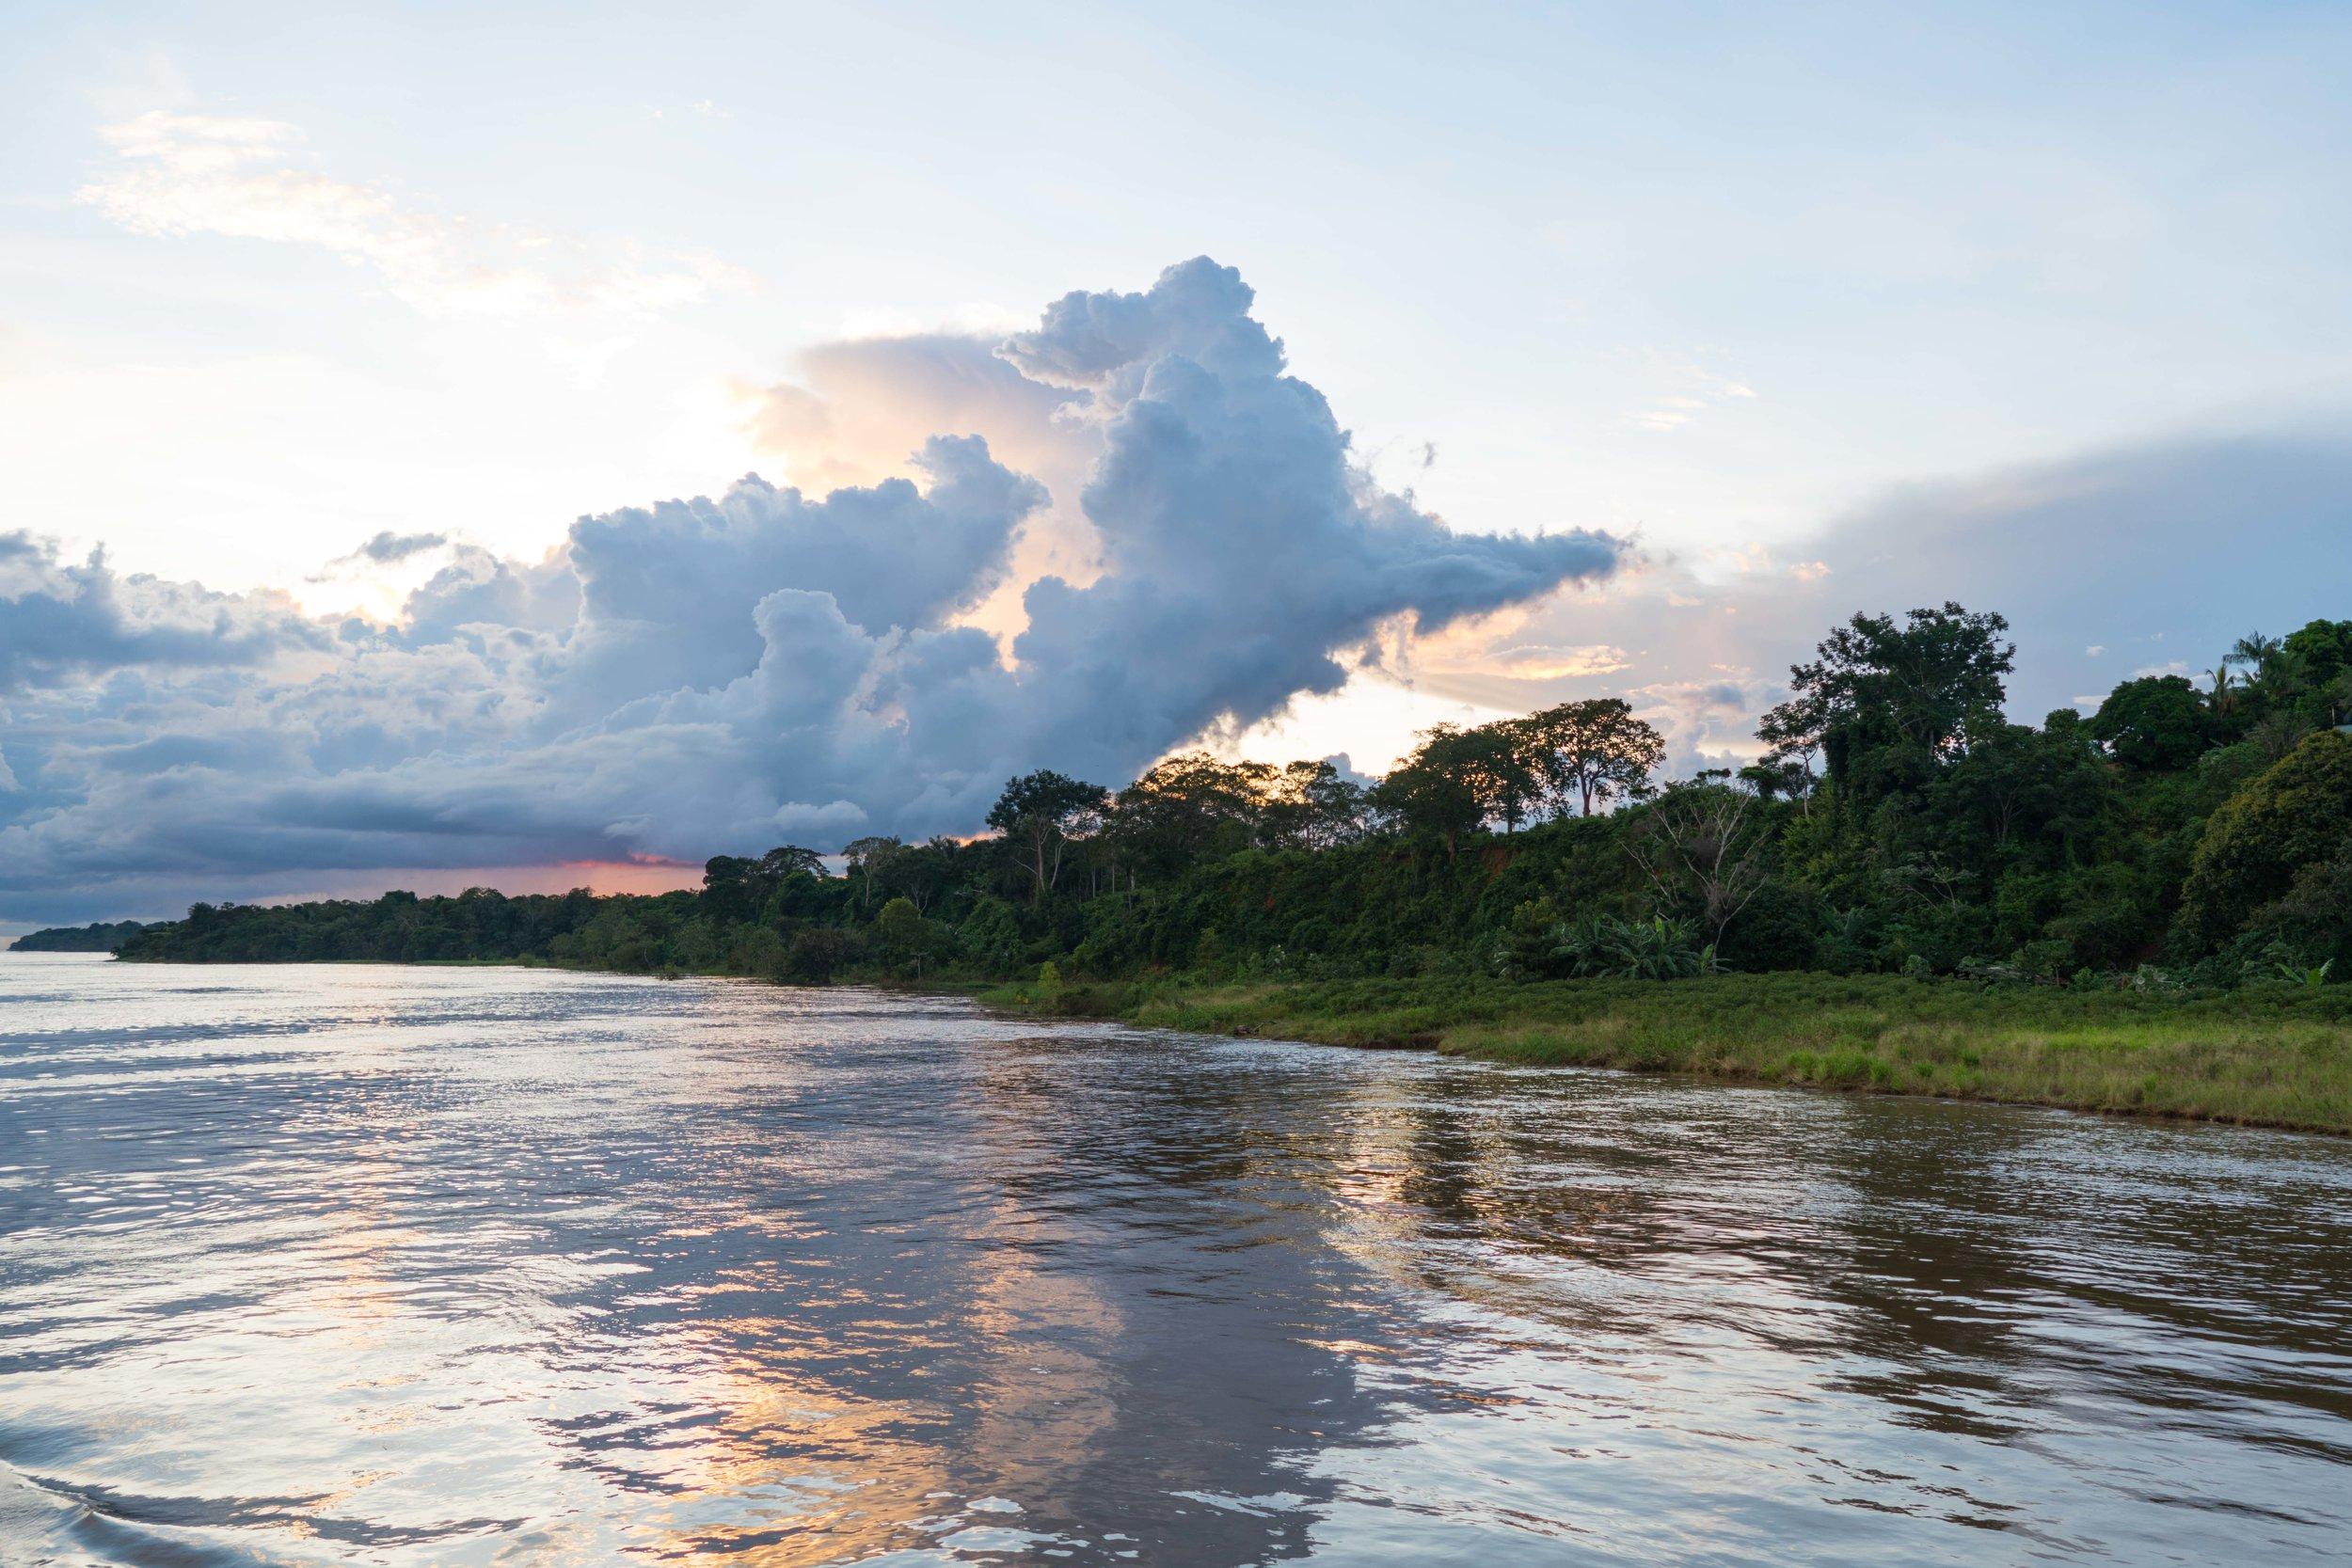 The Amazon, Brazil